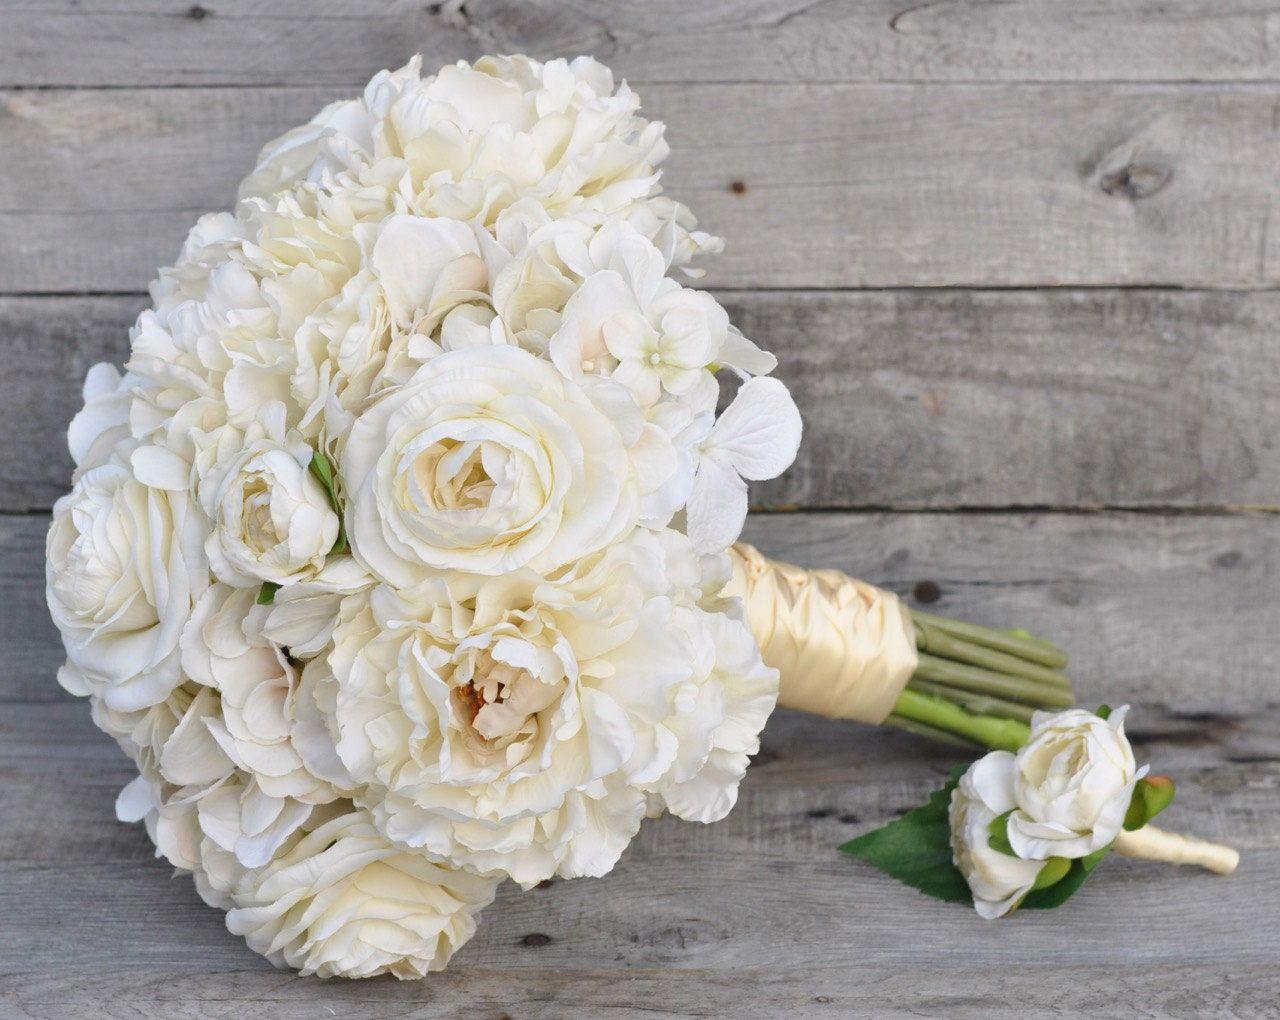 Holly\'s Wedding Flowers ships faux flower bouquets worldwide Find us ...